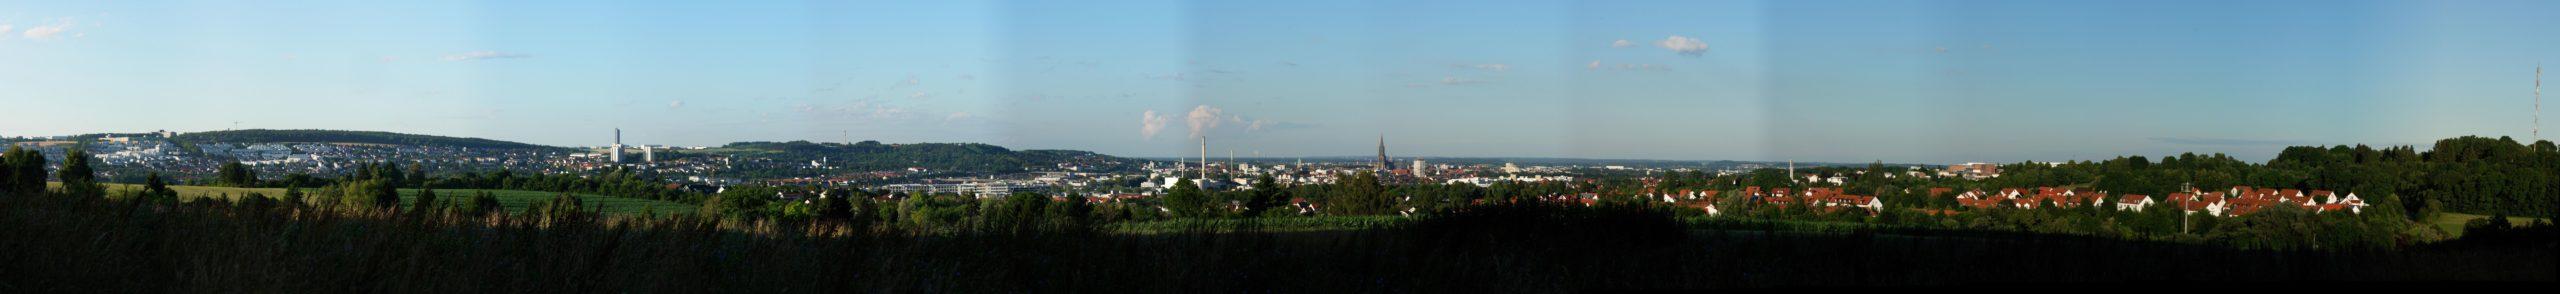 Kinderschminken mit Happy Faces in Ulm und Umgebung